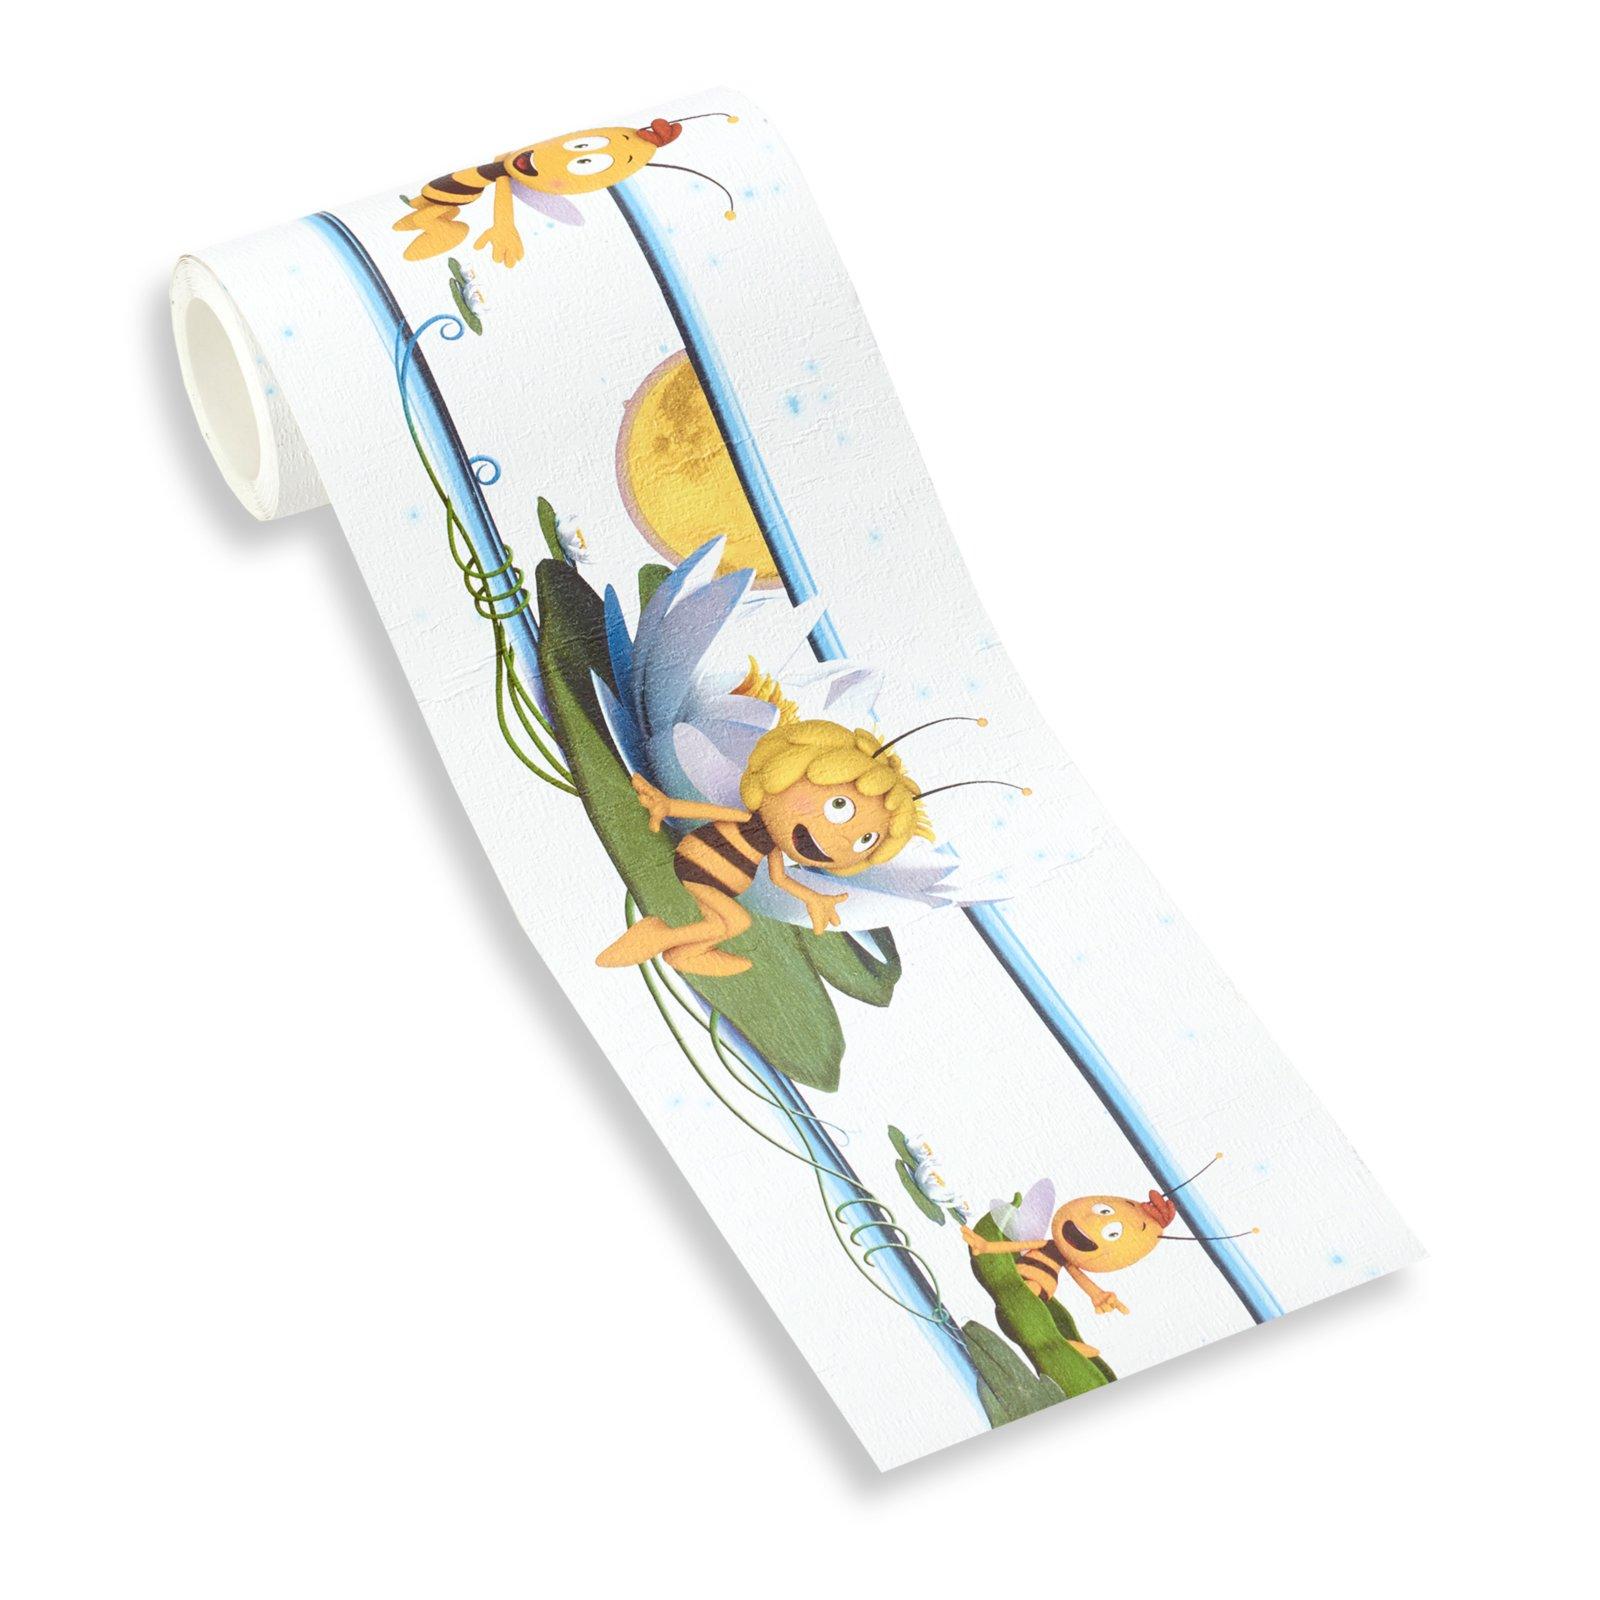 Papier-Borte BIENE MAJA - Kindertapete - 13 cm | Kindertapeten ...